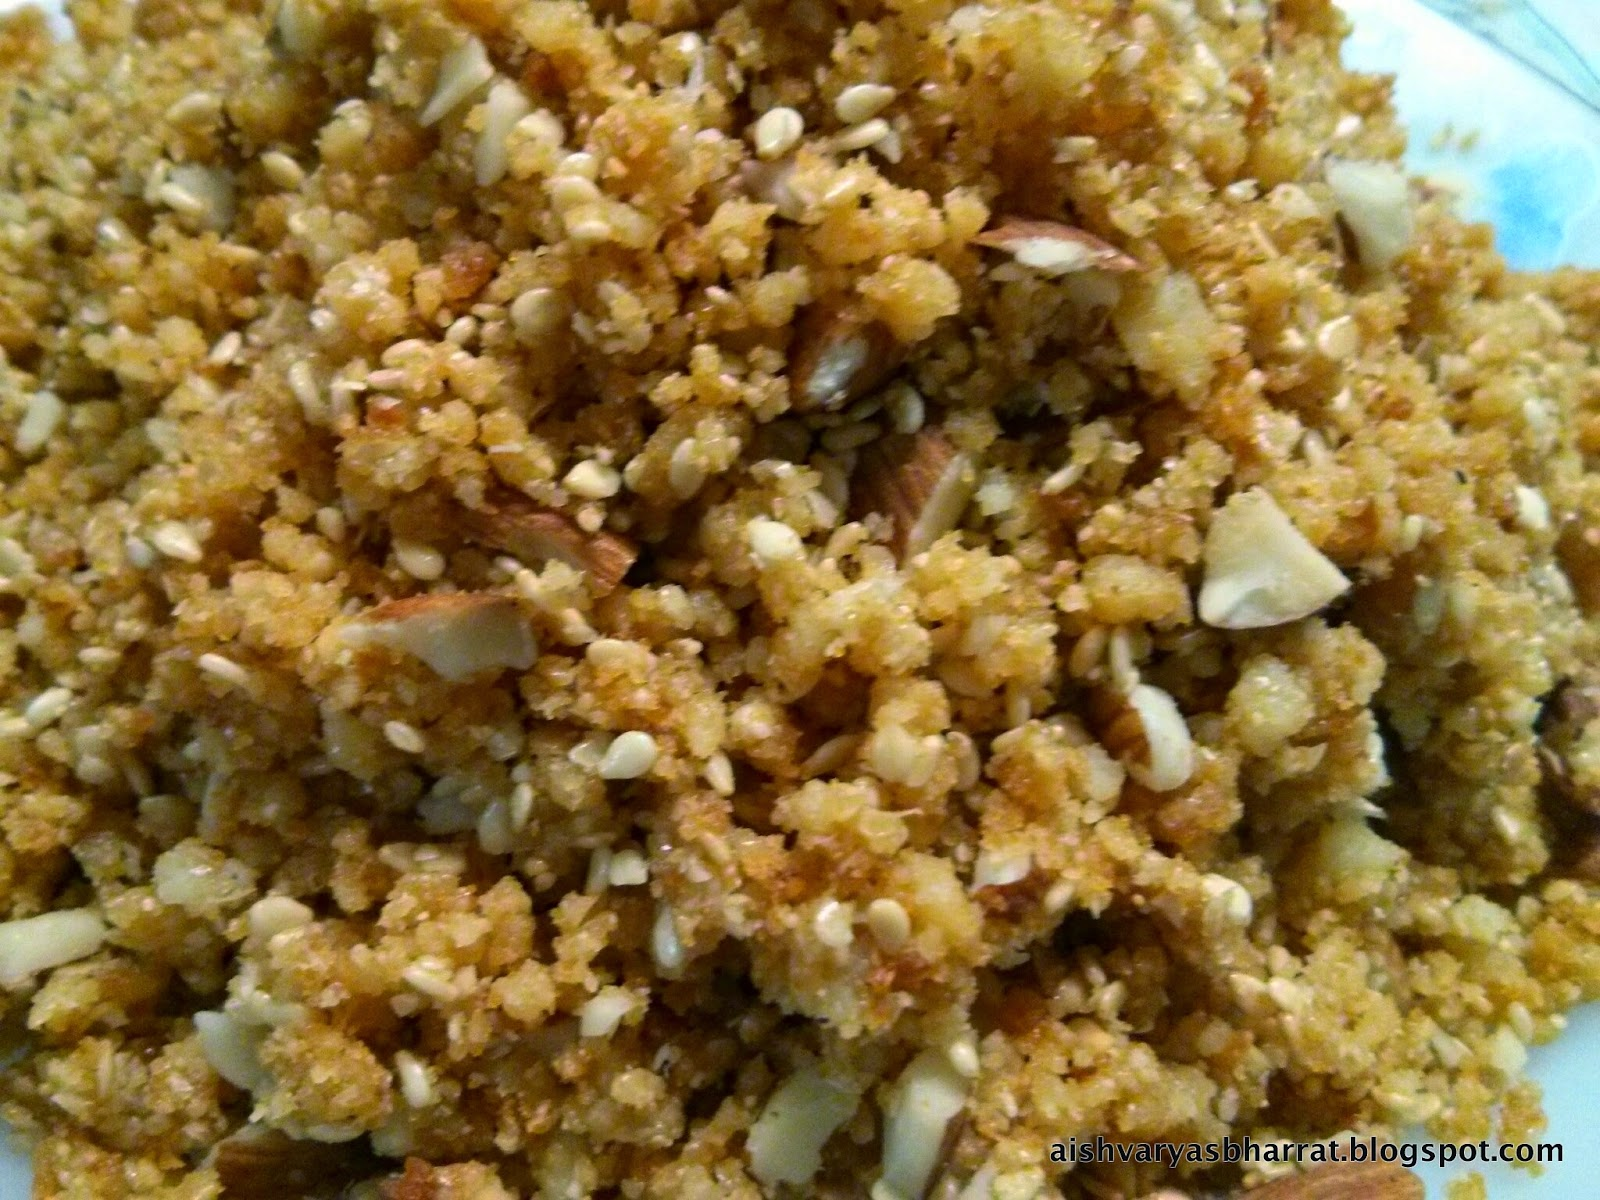 Aishvarya's Kitchen: #Sesame seeds